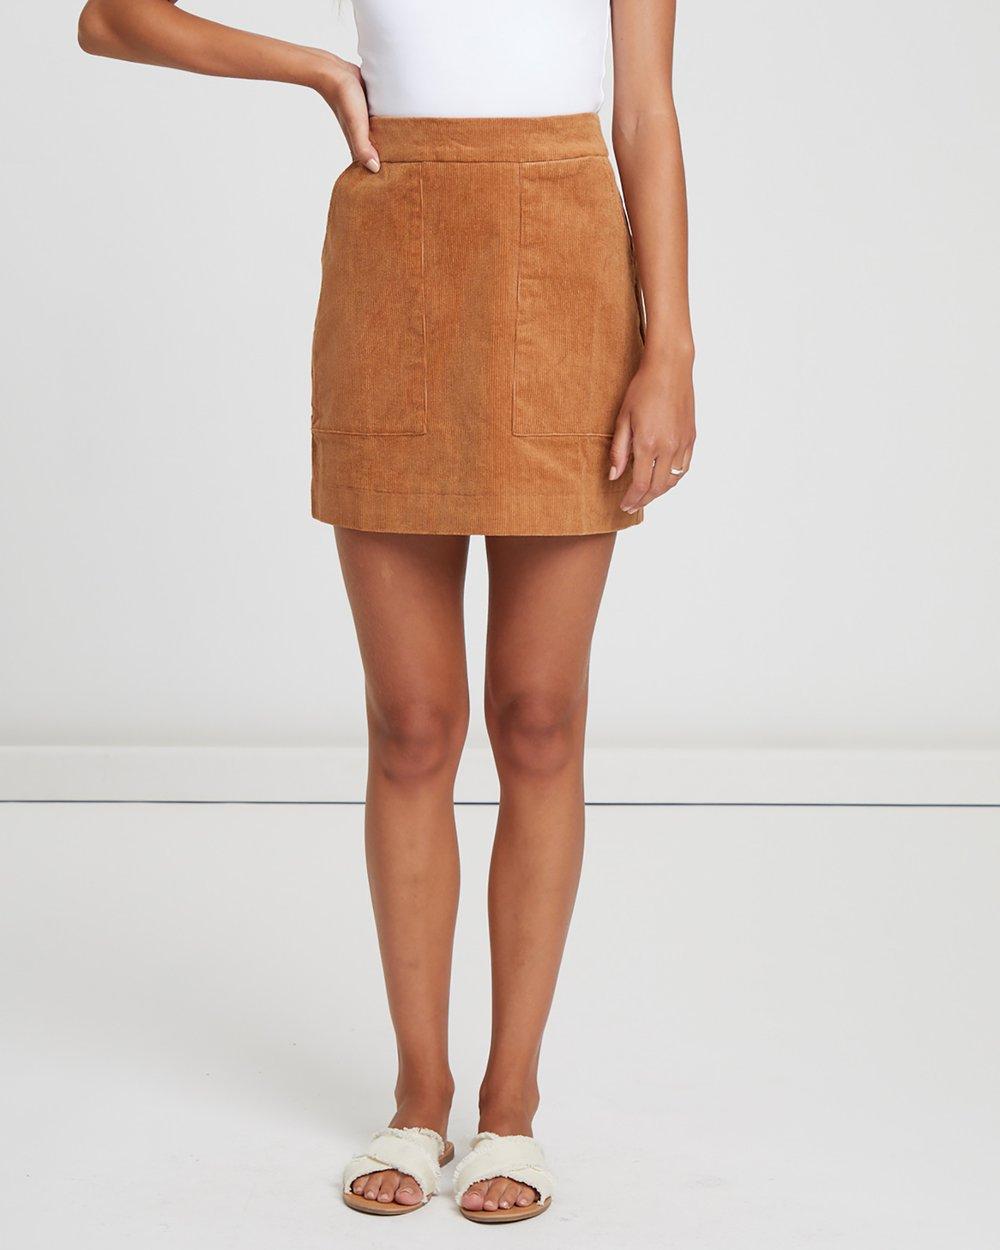 The Fated Triumph Mini Skirt